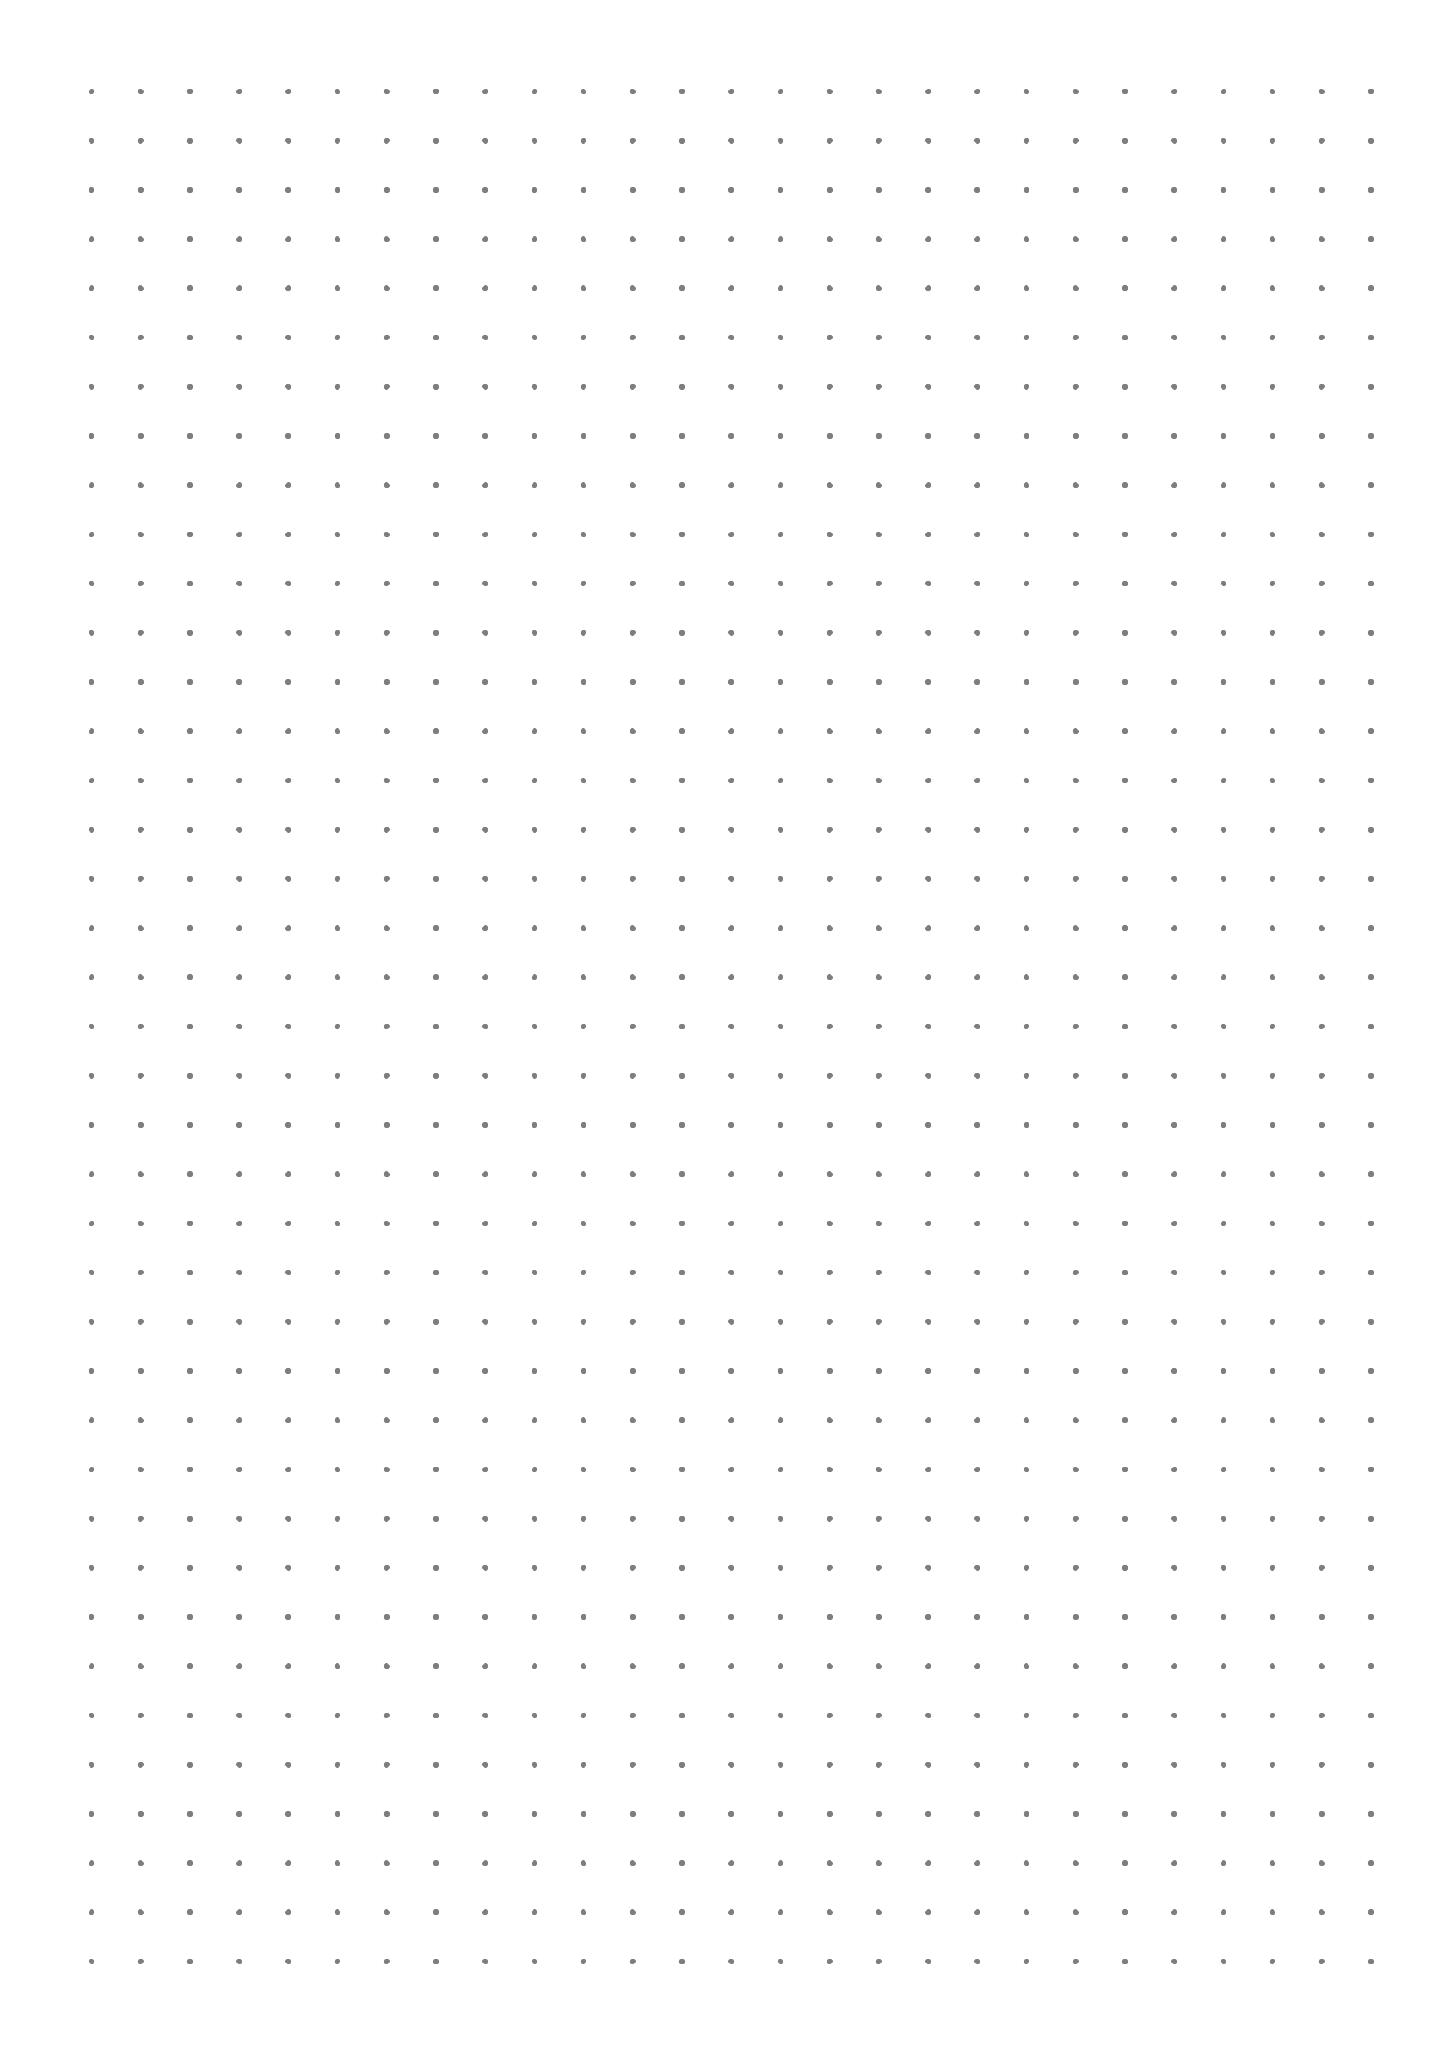 Printable Dot Grid Paper With 5 Mm Spacing Pdf Download In 2020 Bullet Journal Dot Grid Printable Graph Paper Bullet Journal Paper